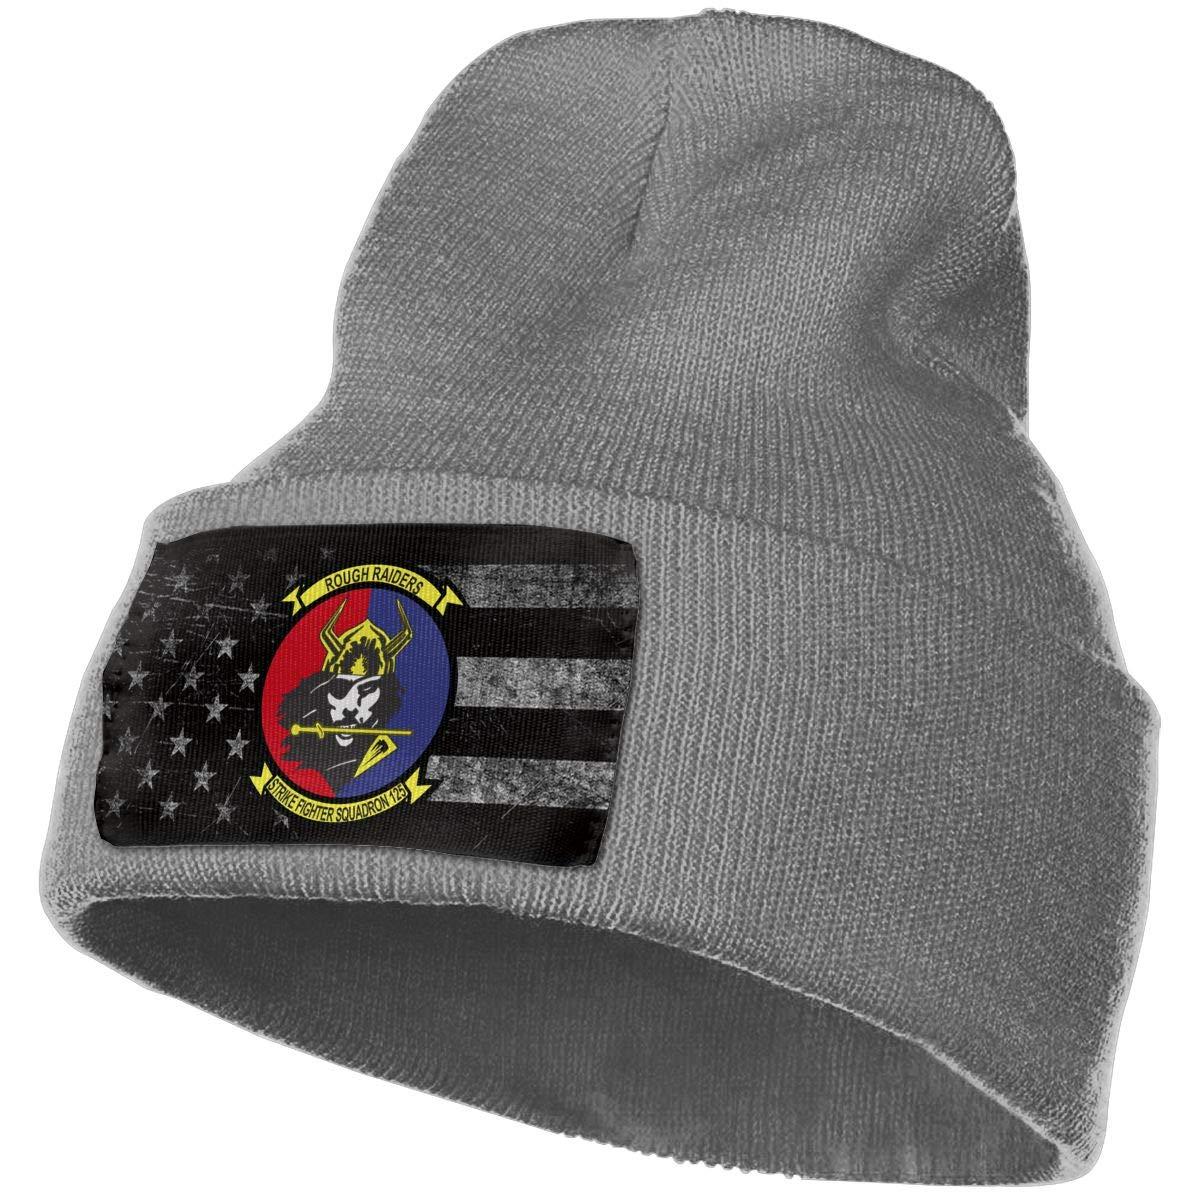 VFA-146 Blue Diamonds Mens Beanie Cap Skull Cap Winter Warm Knitting Hats.